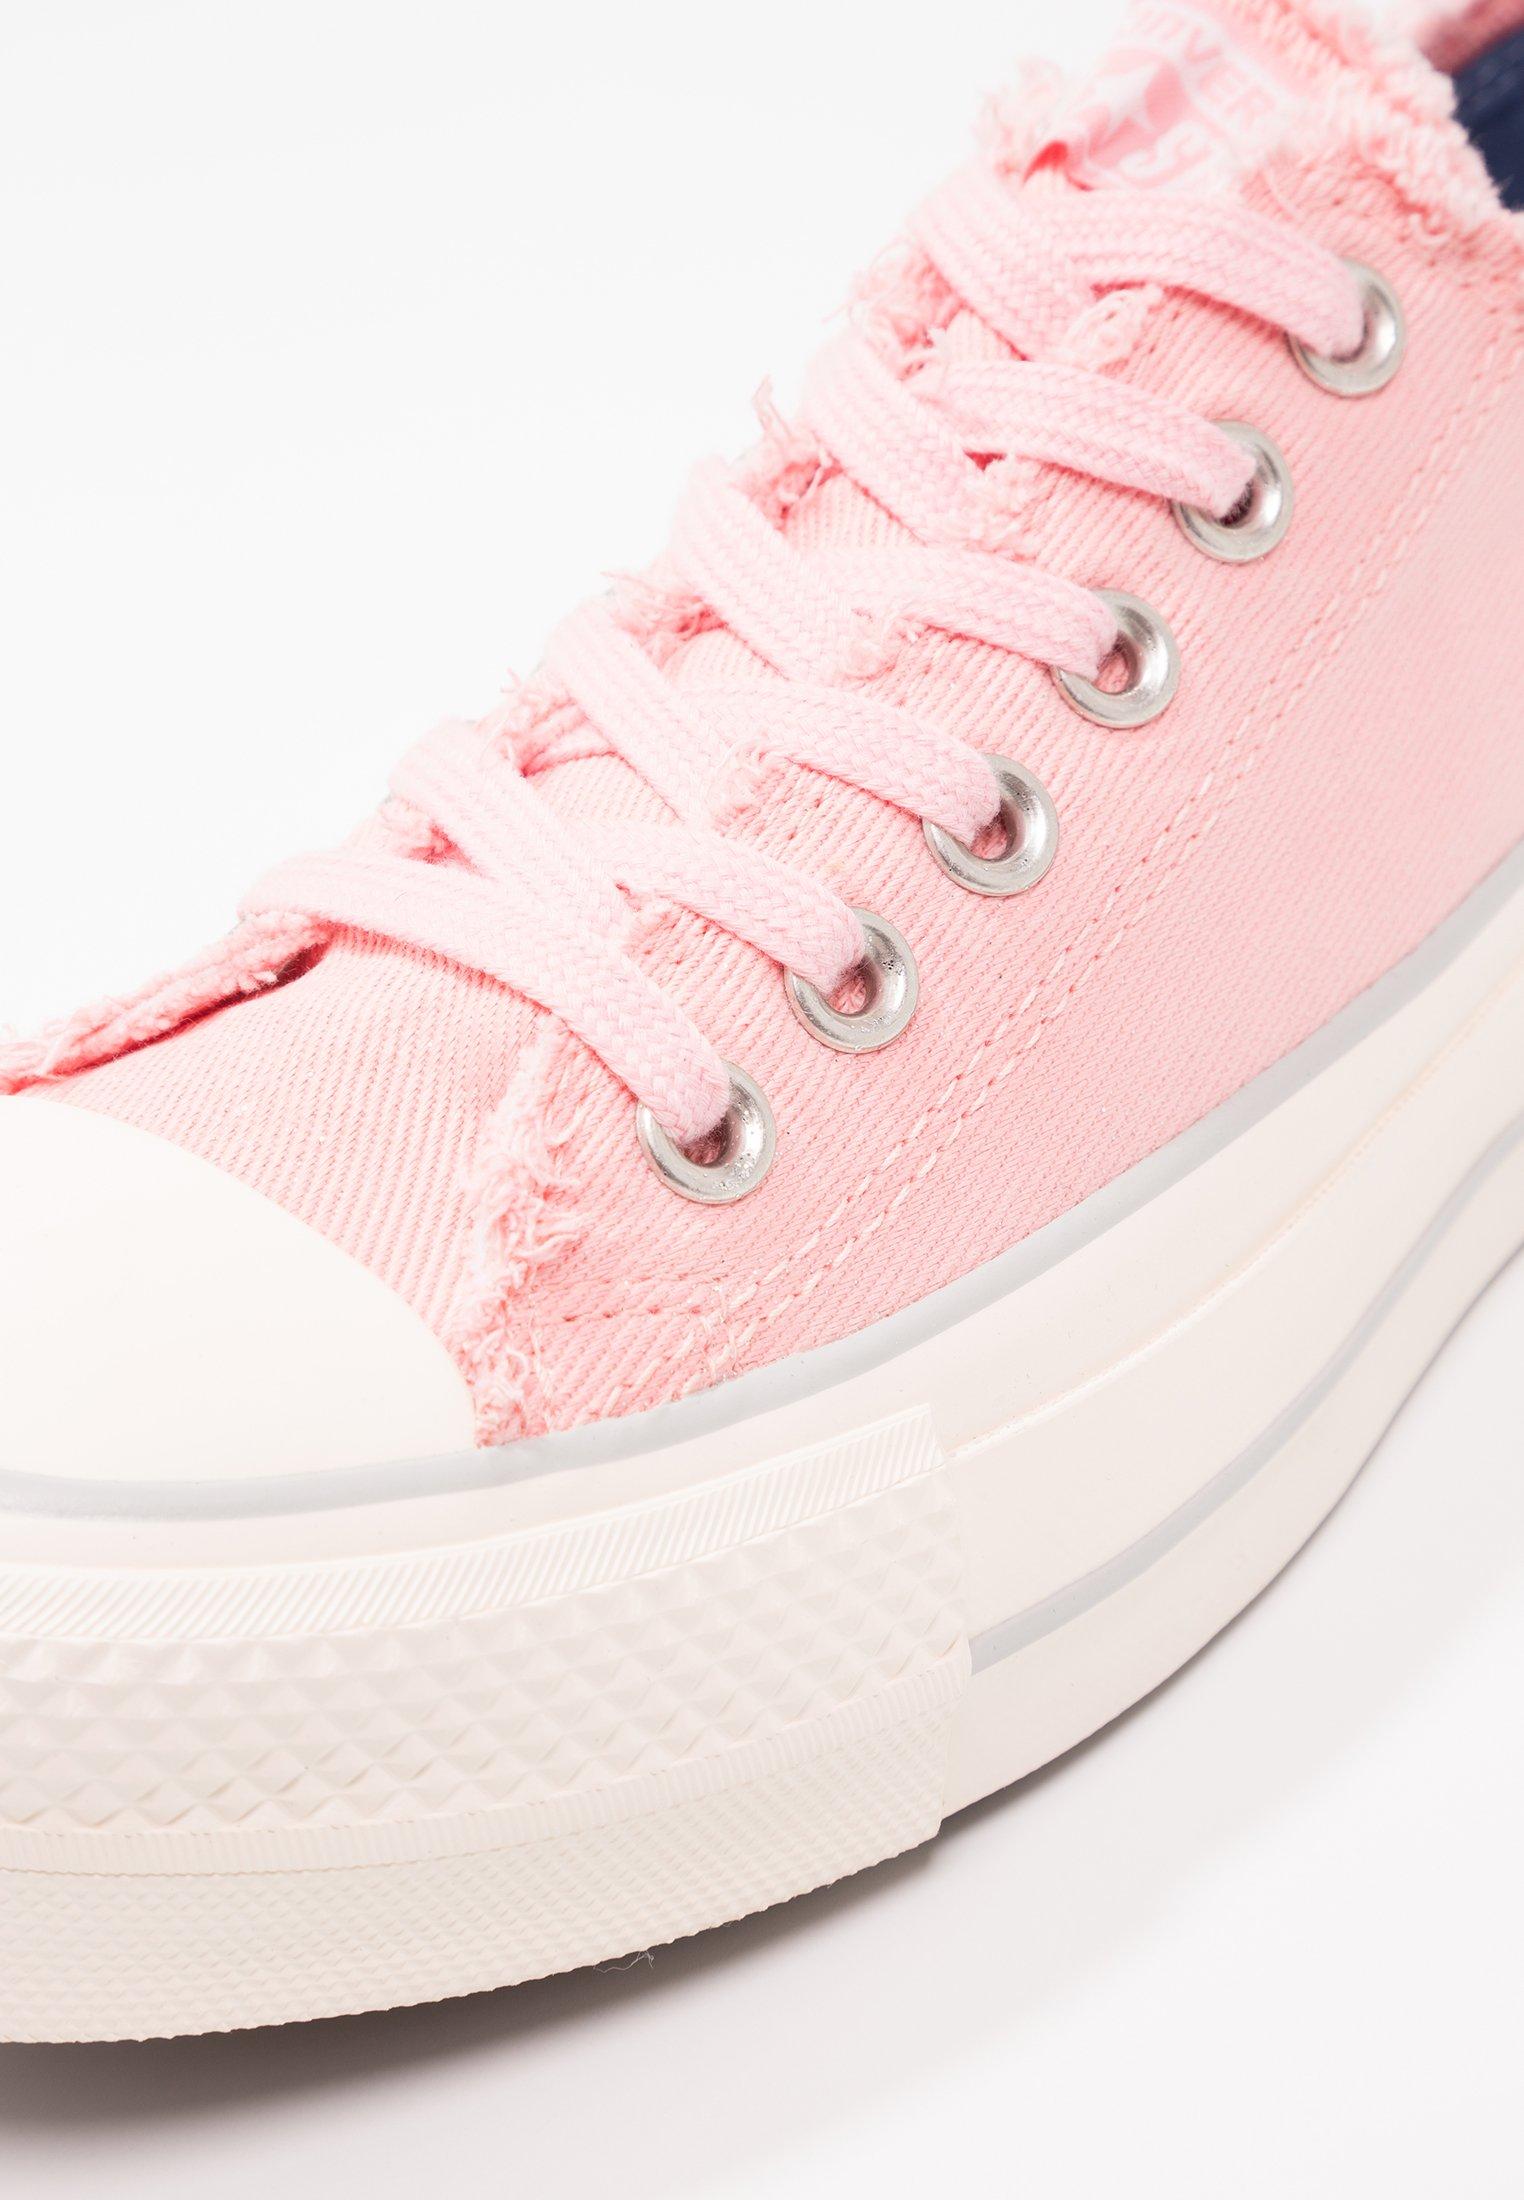 converse platform basse rosa